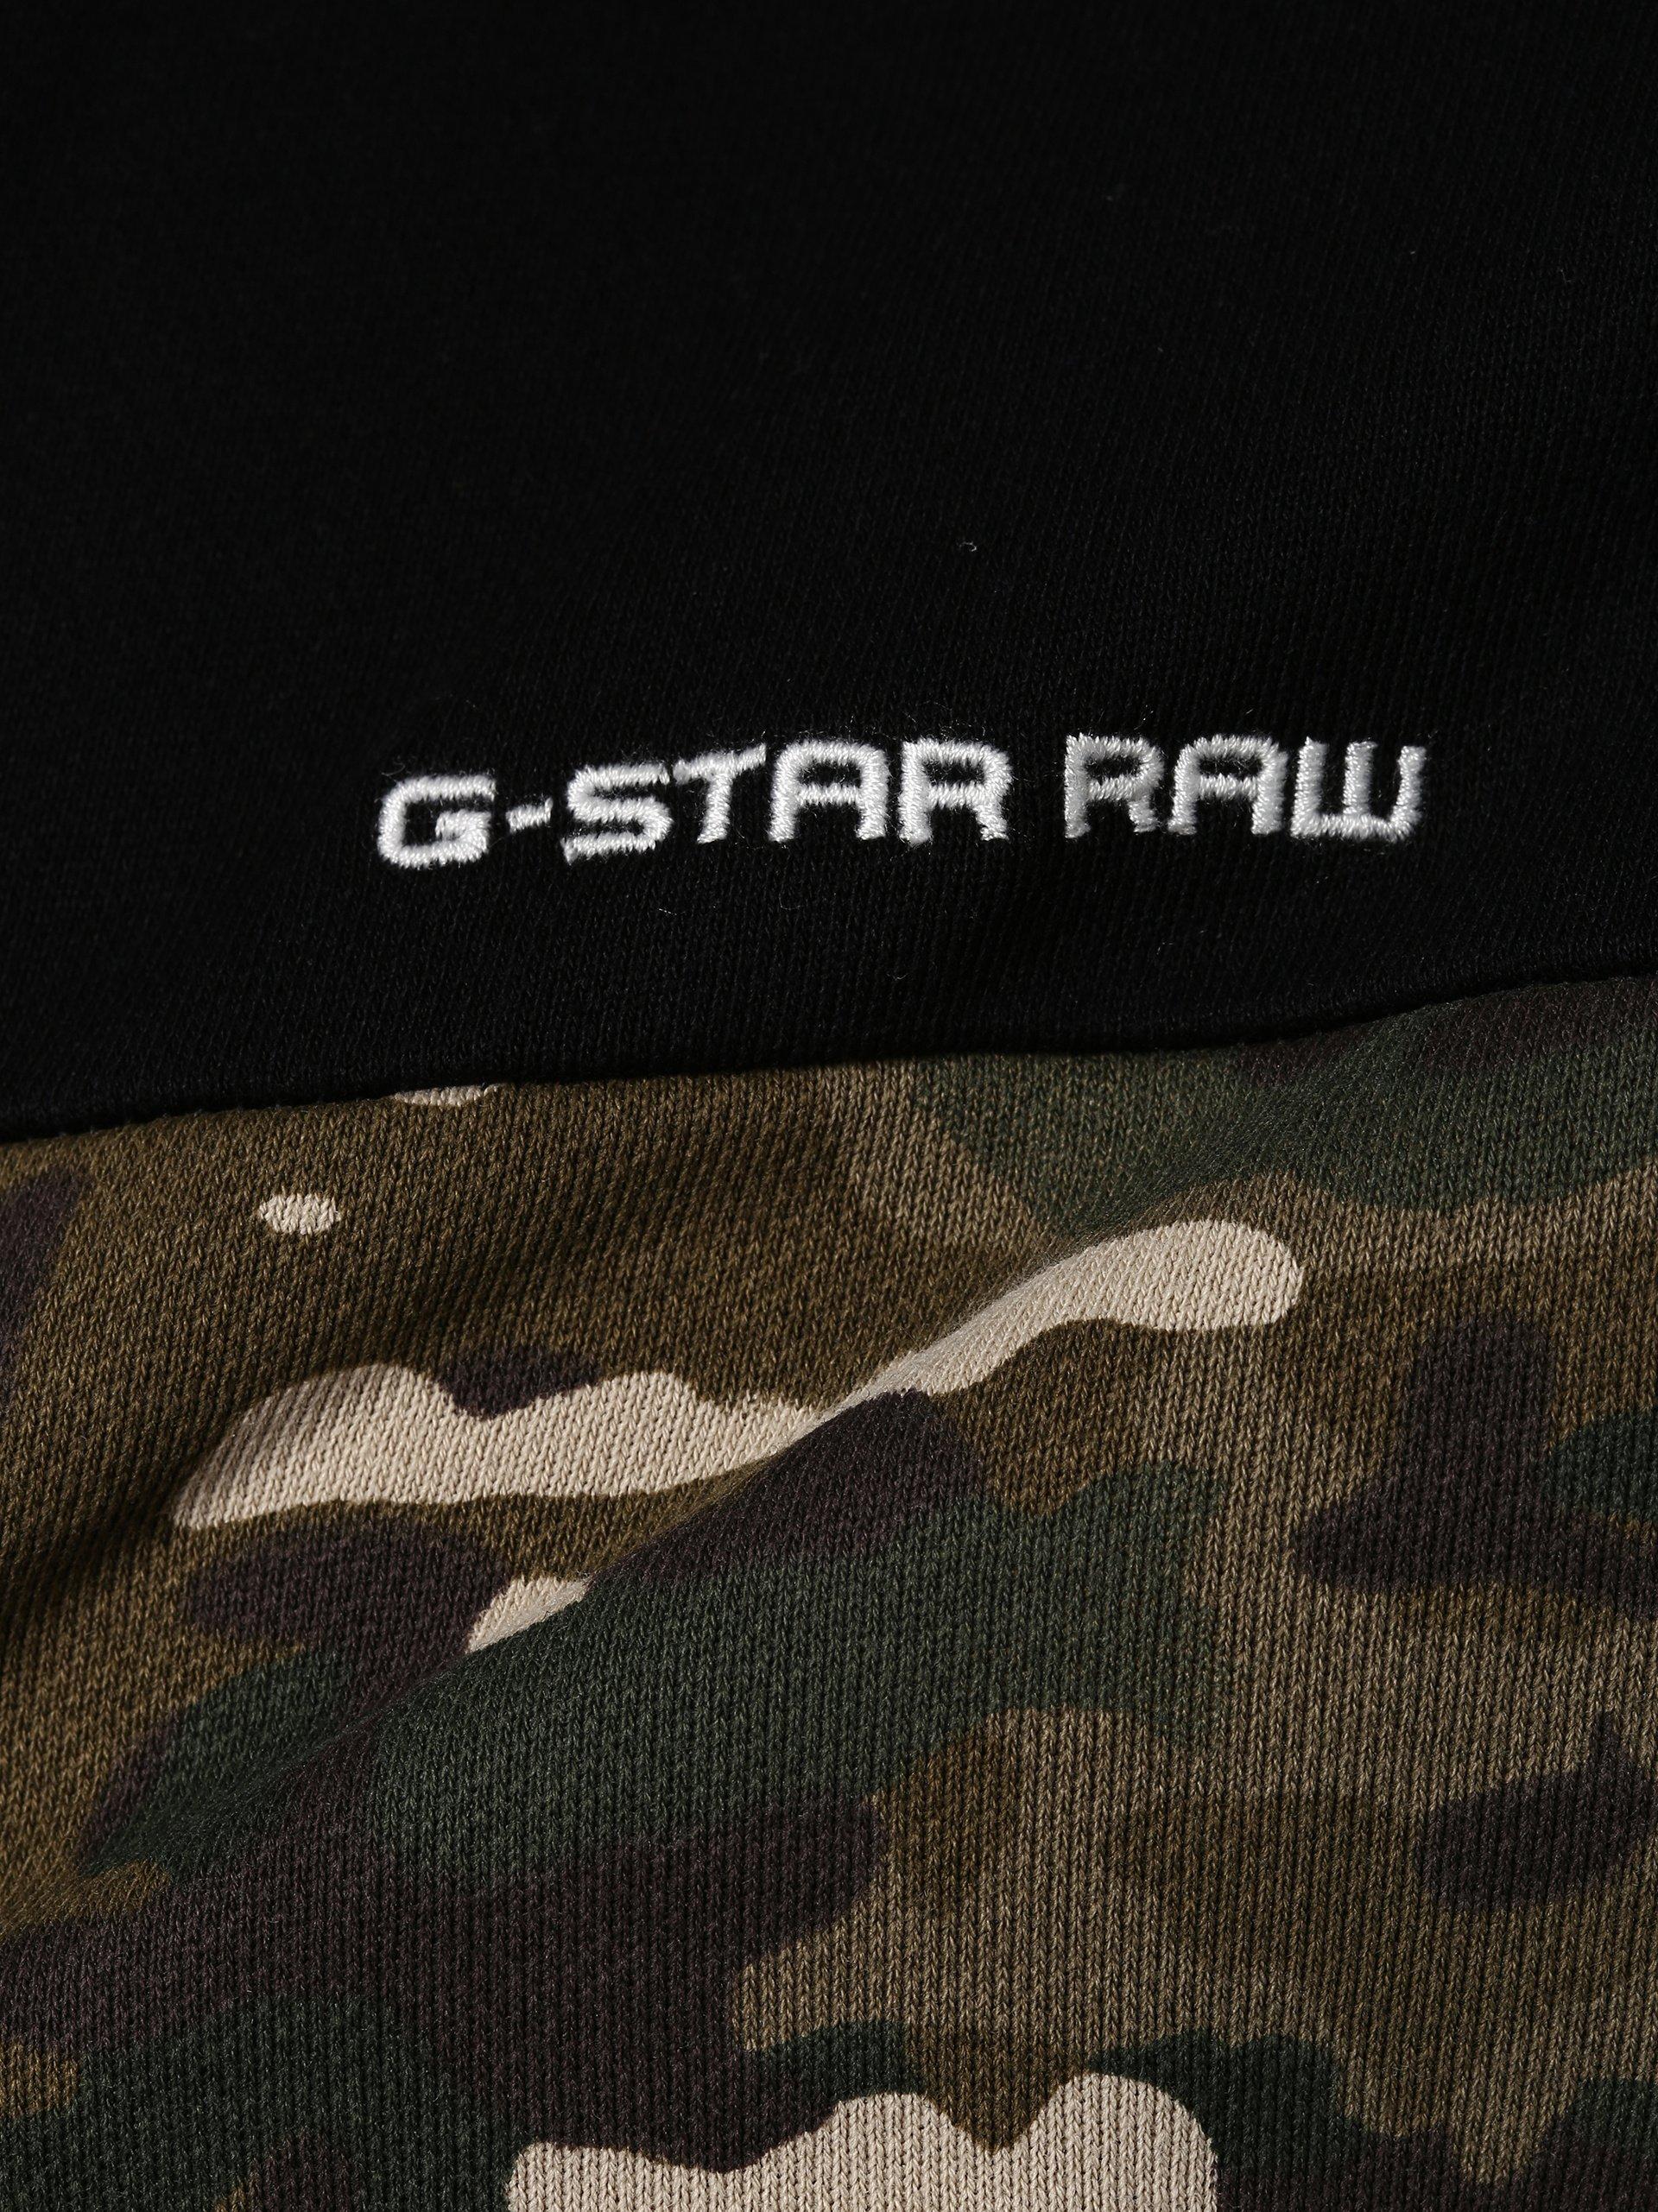 G-Star RAW Męska bluza nierozpinana